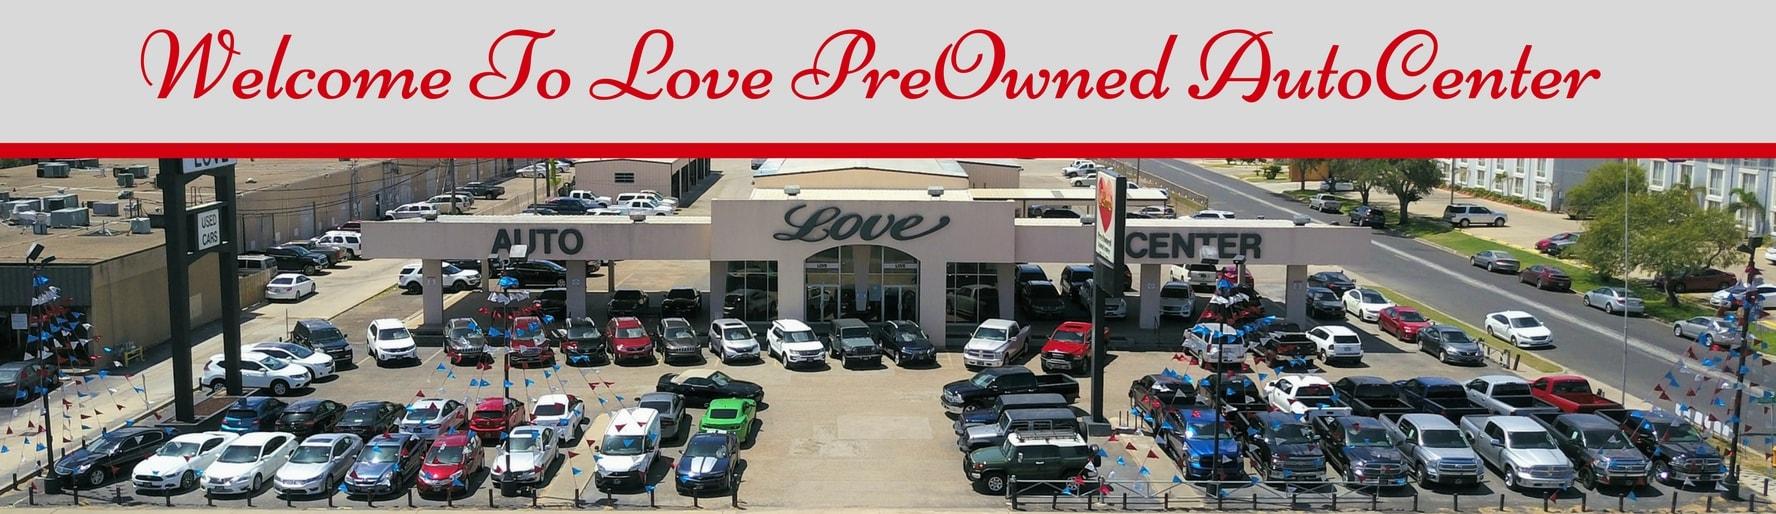 Ford Dealership Corpus Christi >> Love PreOwned AutoCenter | New dealership in Corpus Christi, TX 78411(888) 928-3086